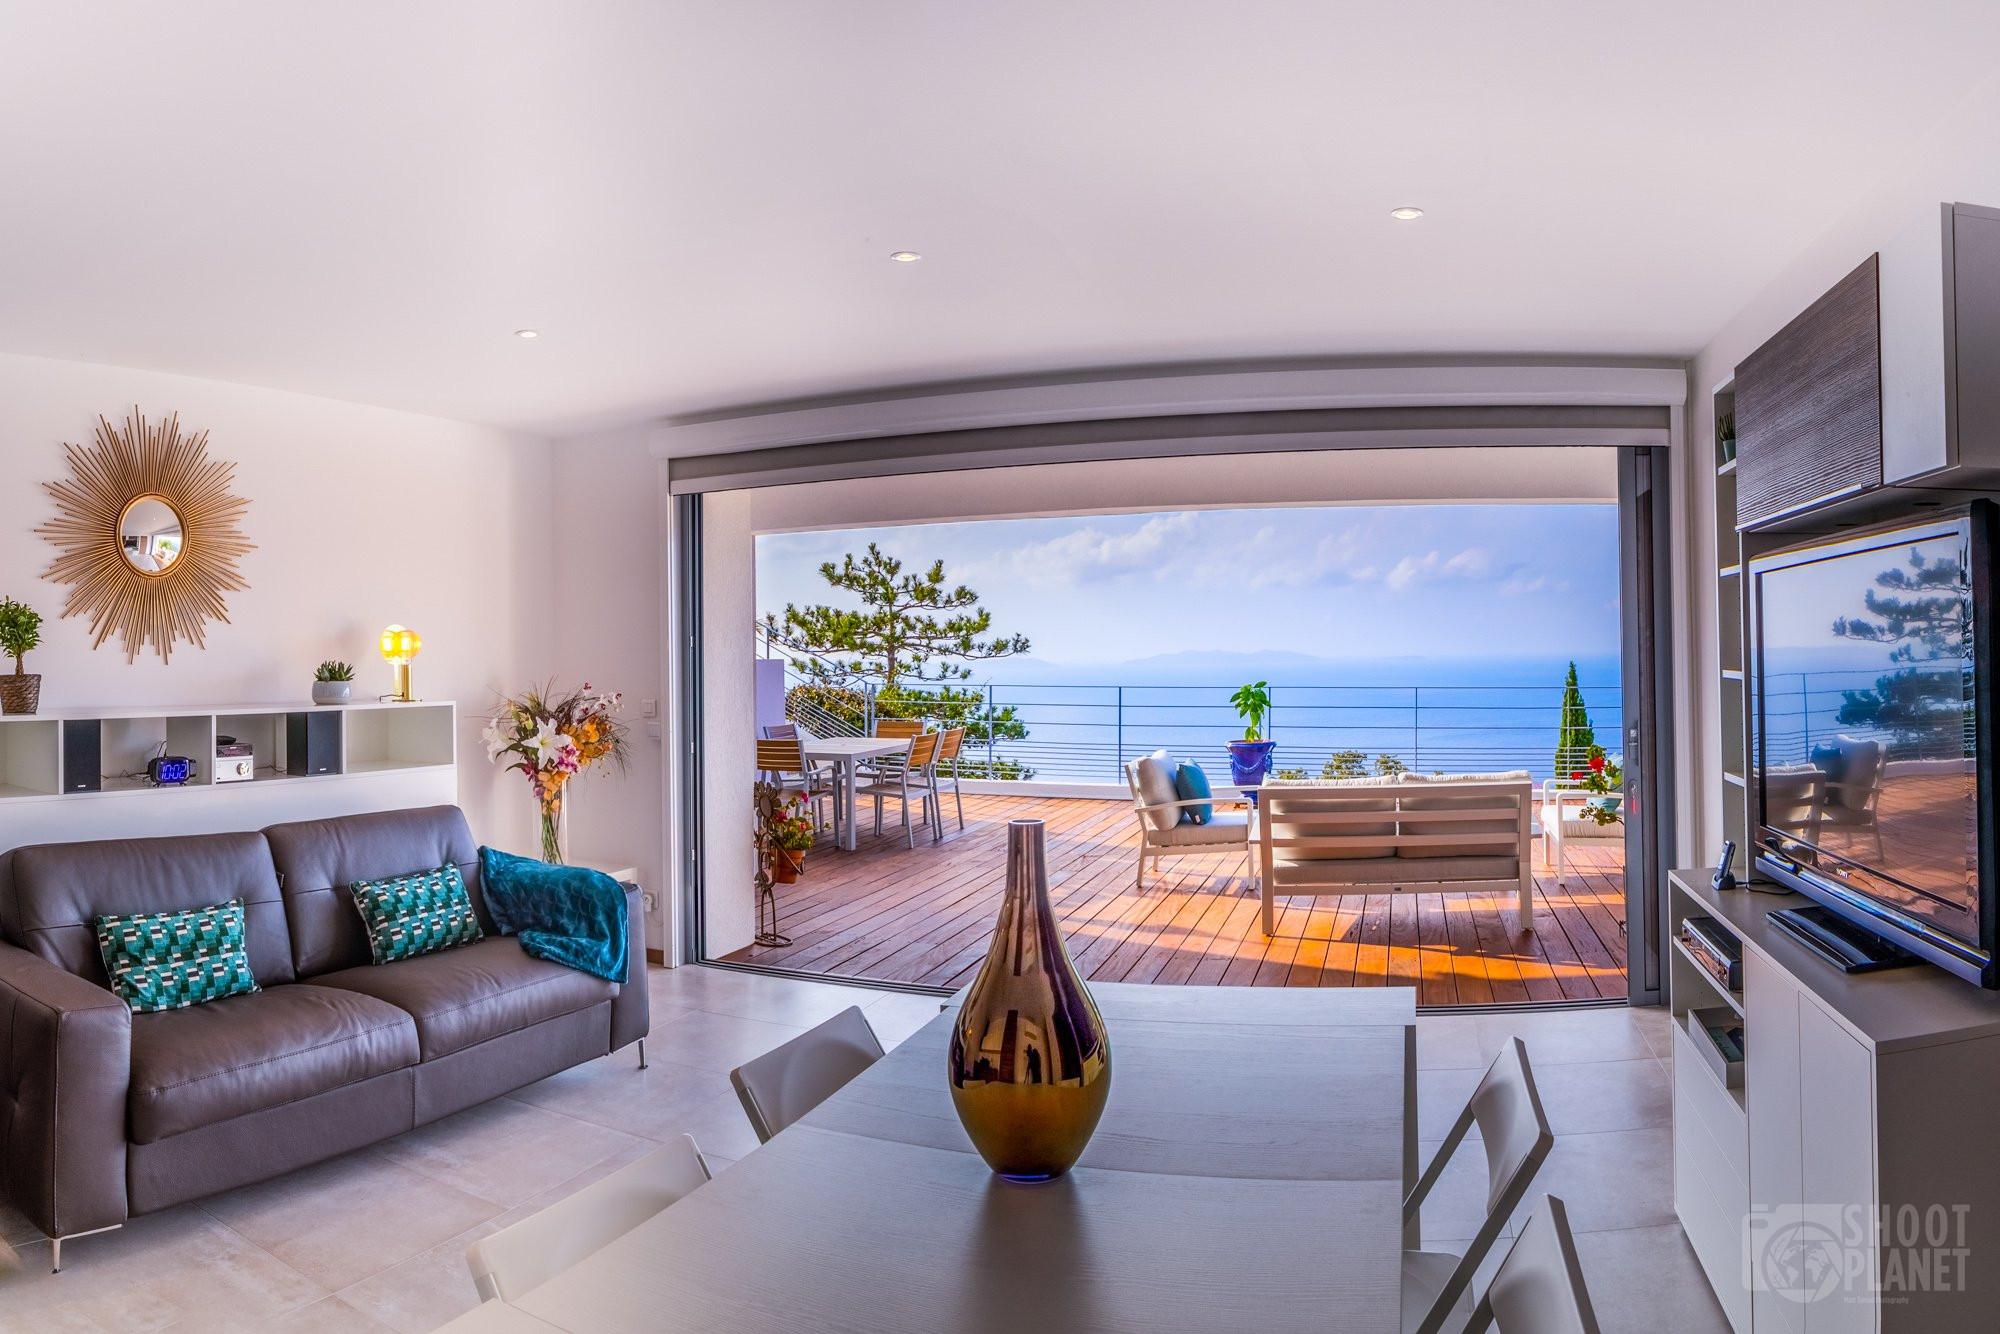 Sea view from Vistazur apartment, Azure Coast France